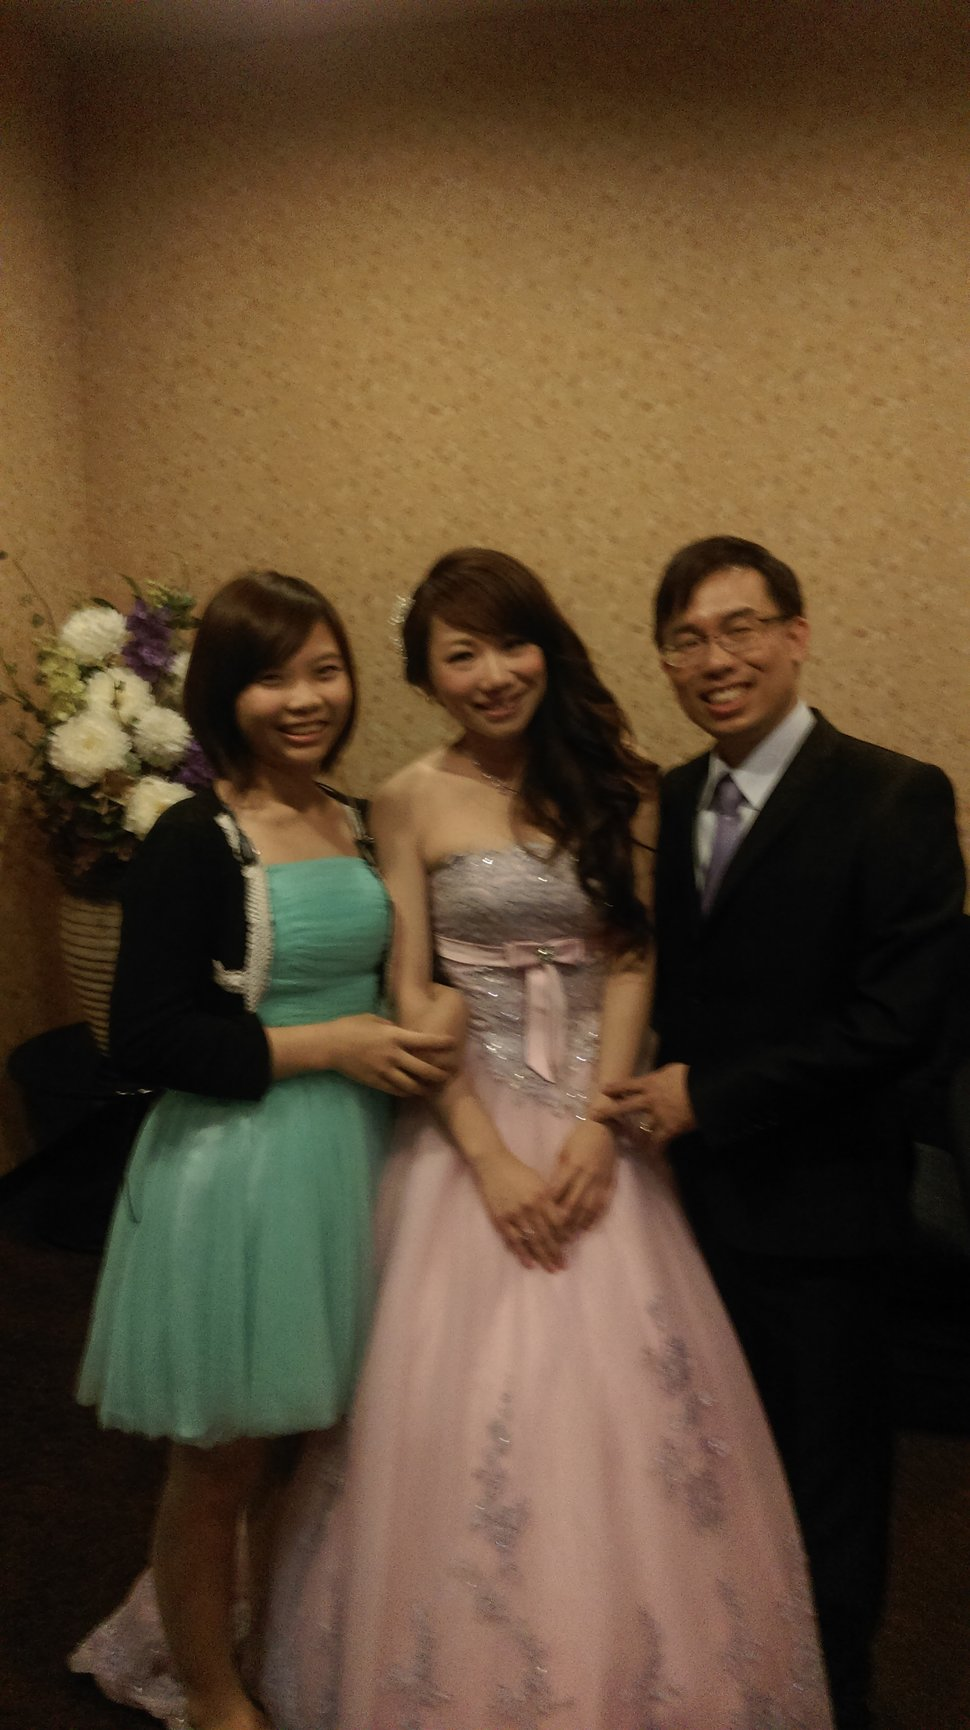 IMAG0480 - 婚禮主持Una - 結婚吧